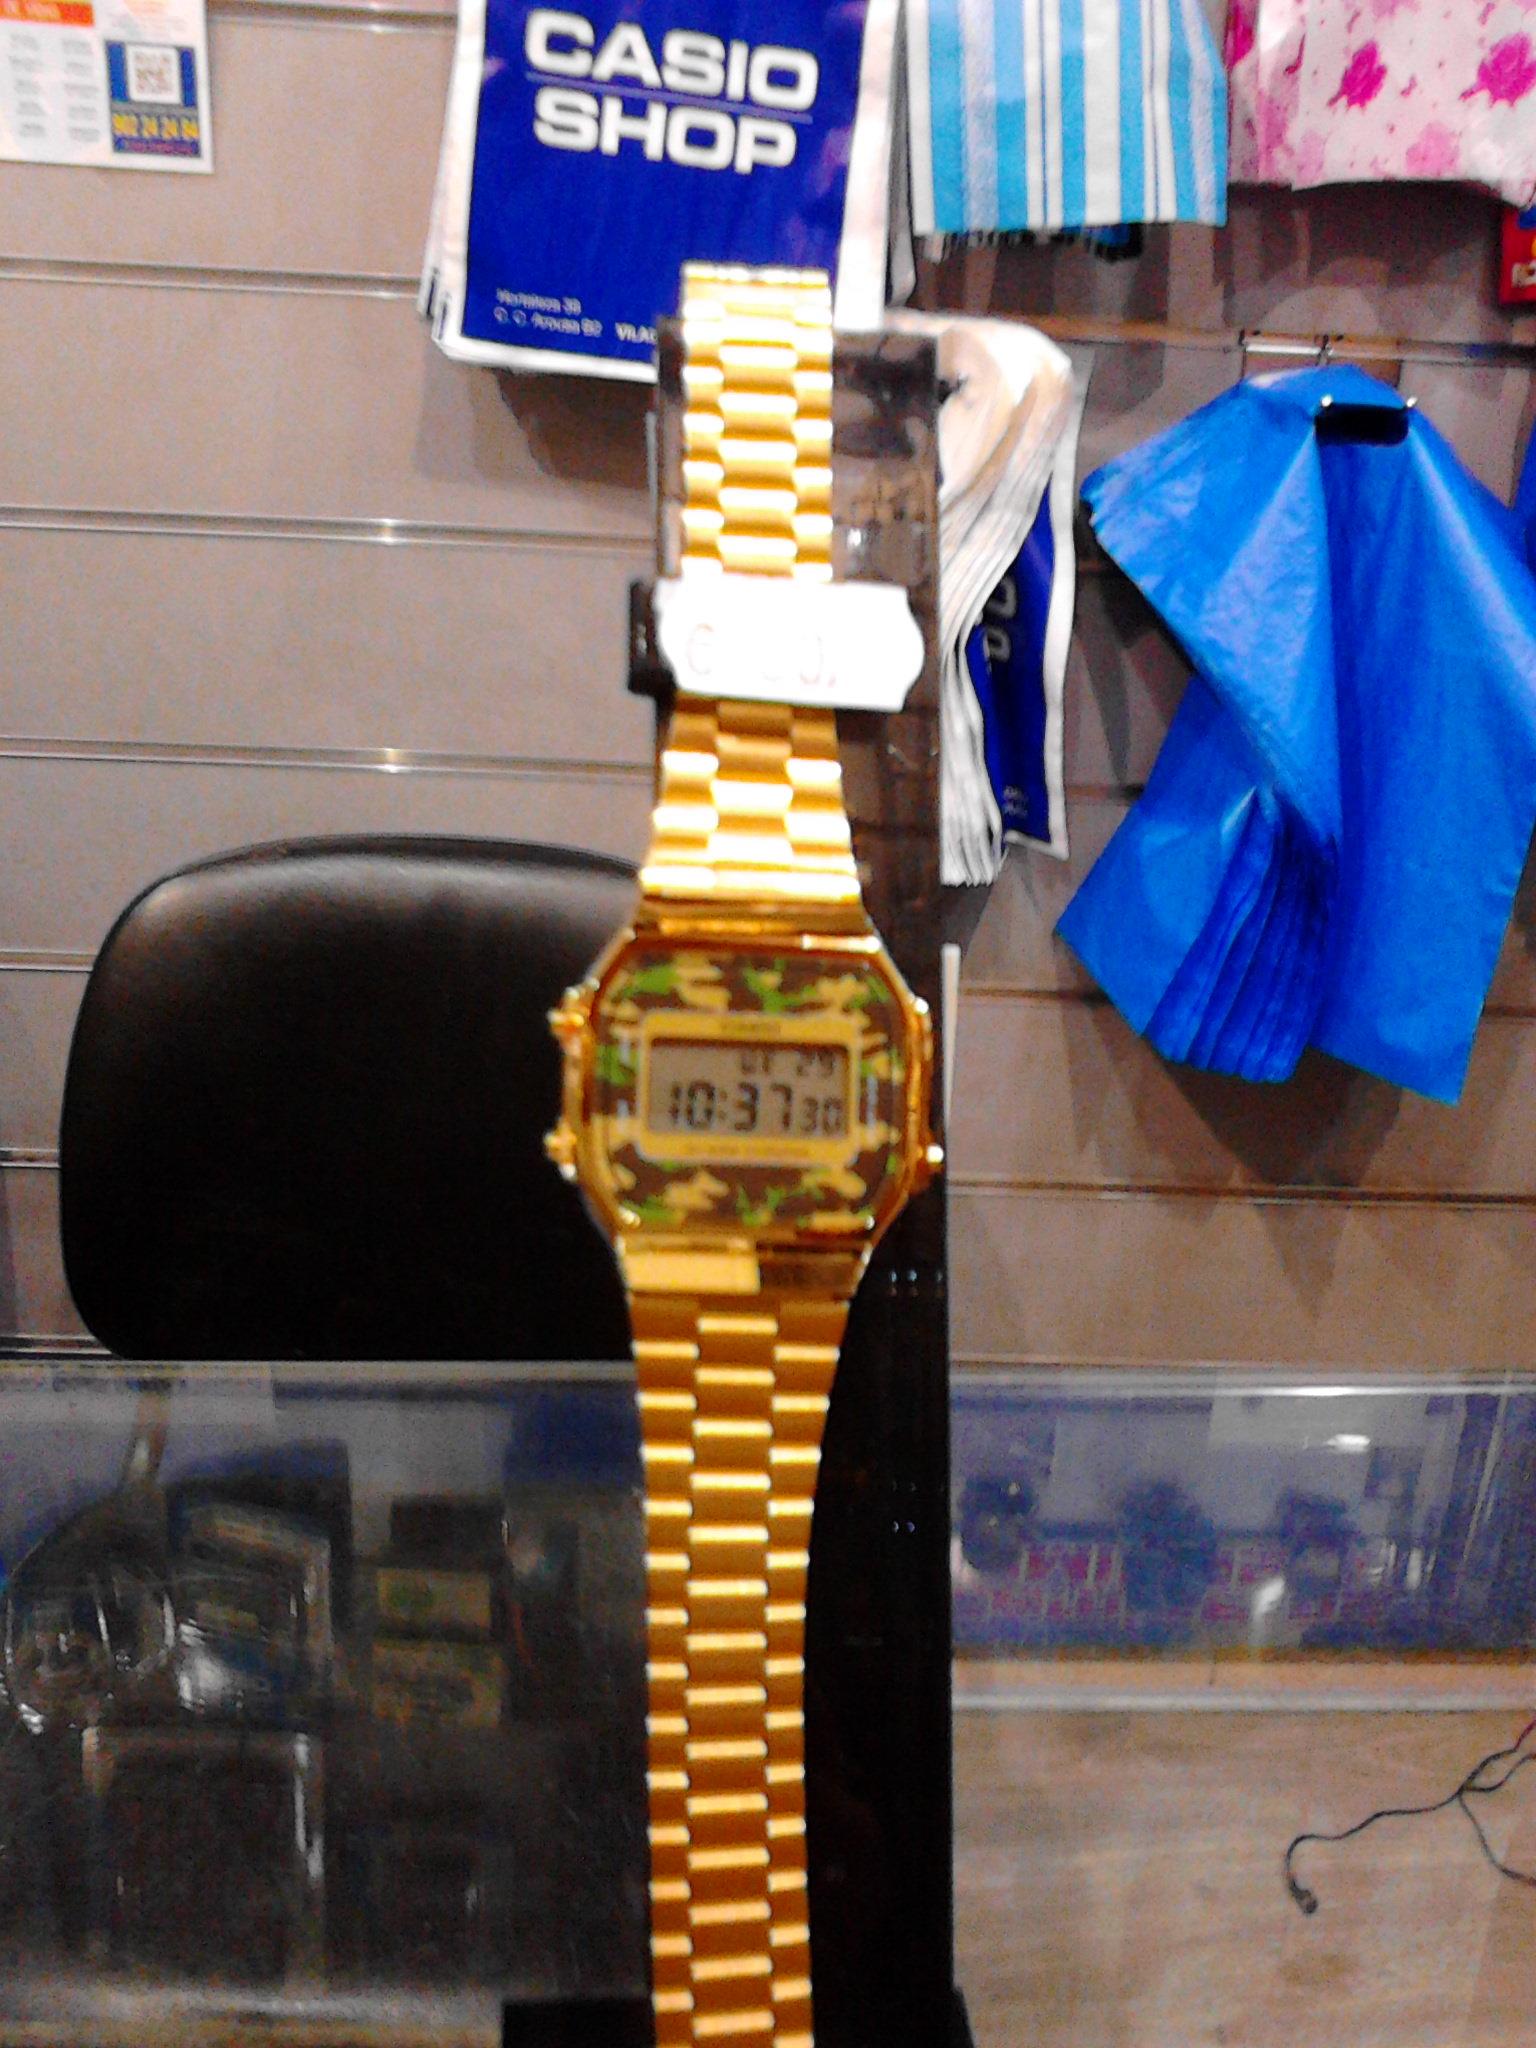 b2dd91ceea90 Nuevo modelo Casio Vintage dorado A168WEGC-3EF